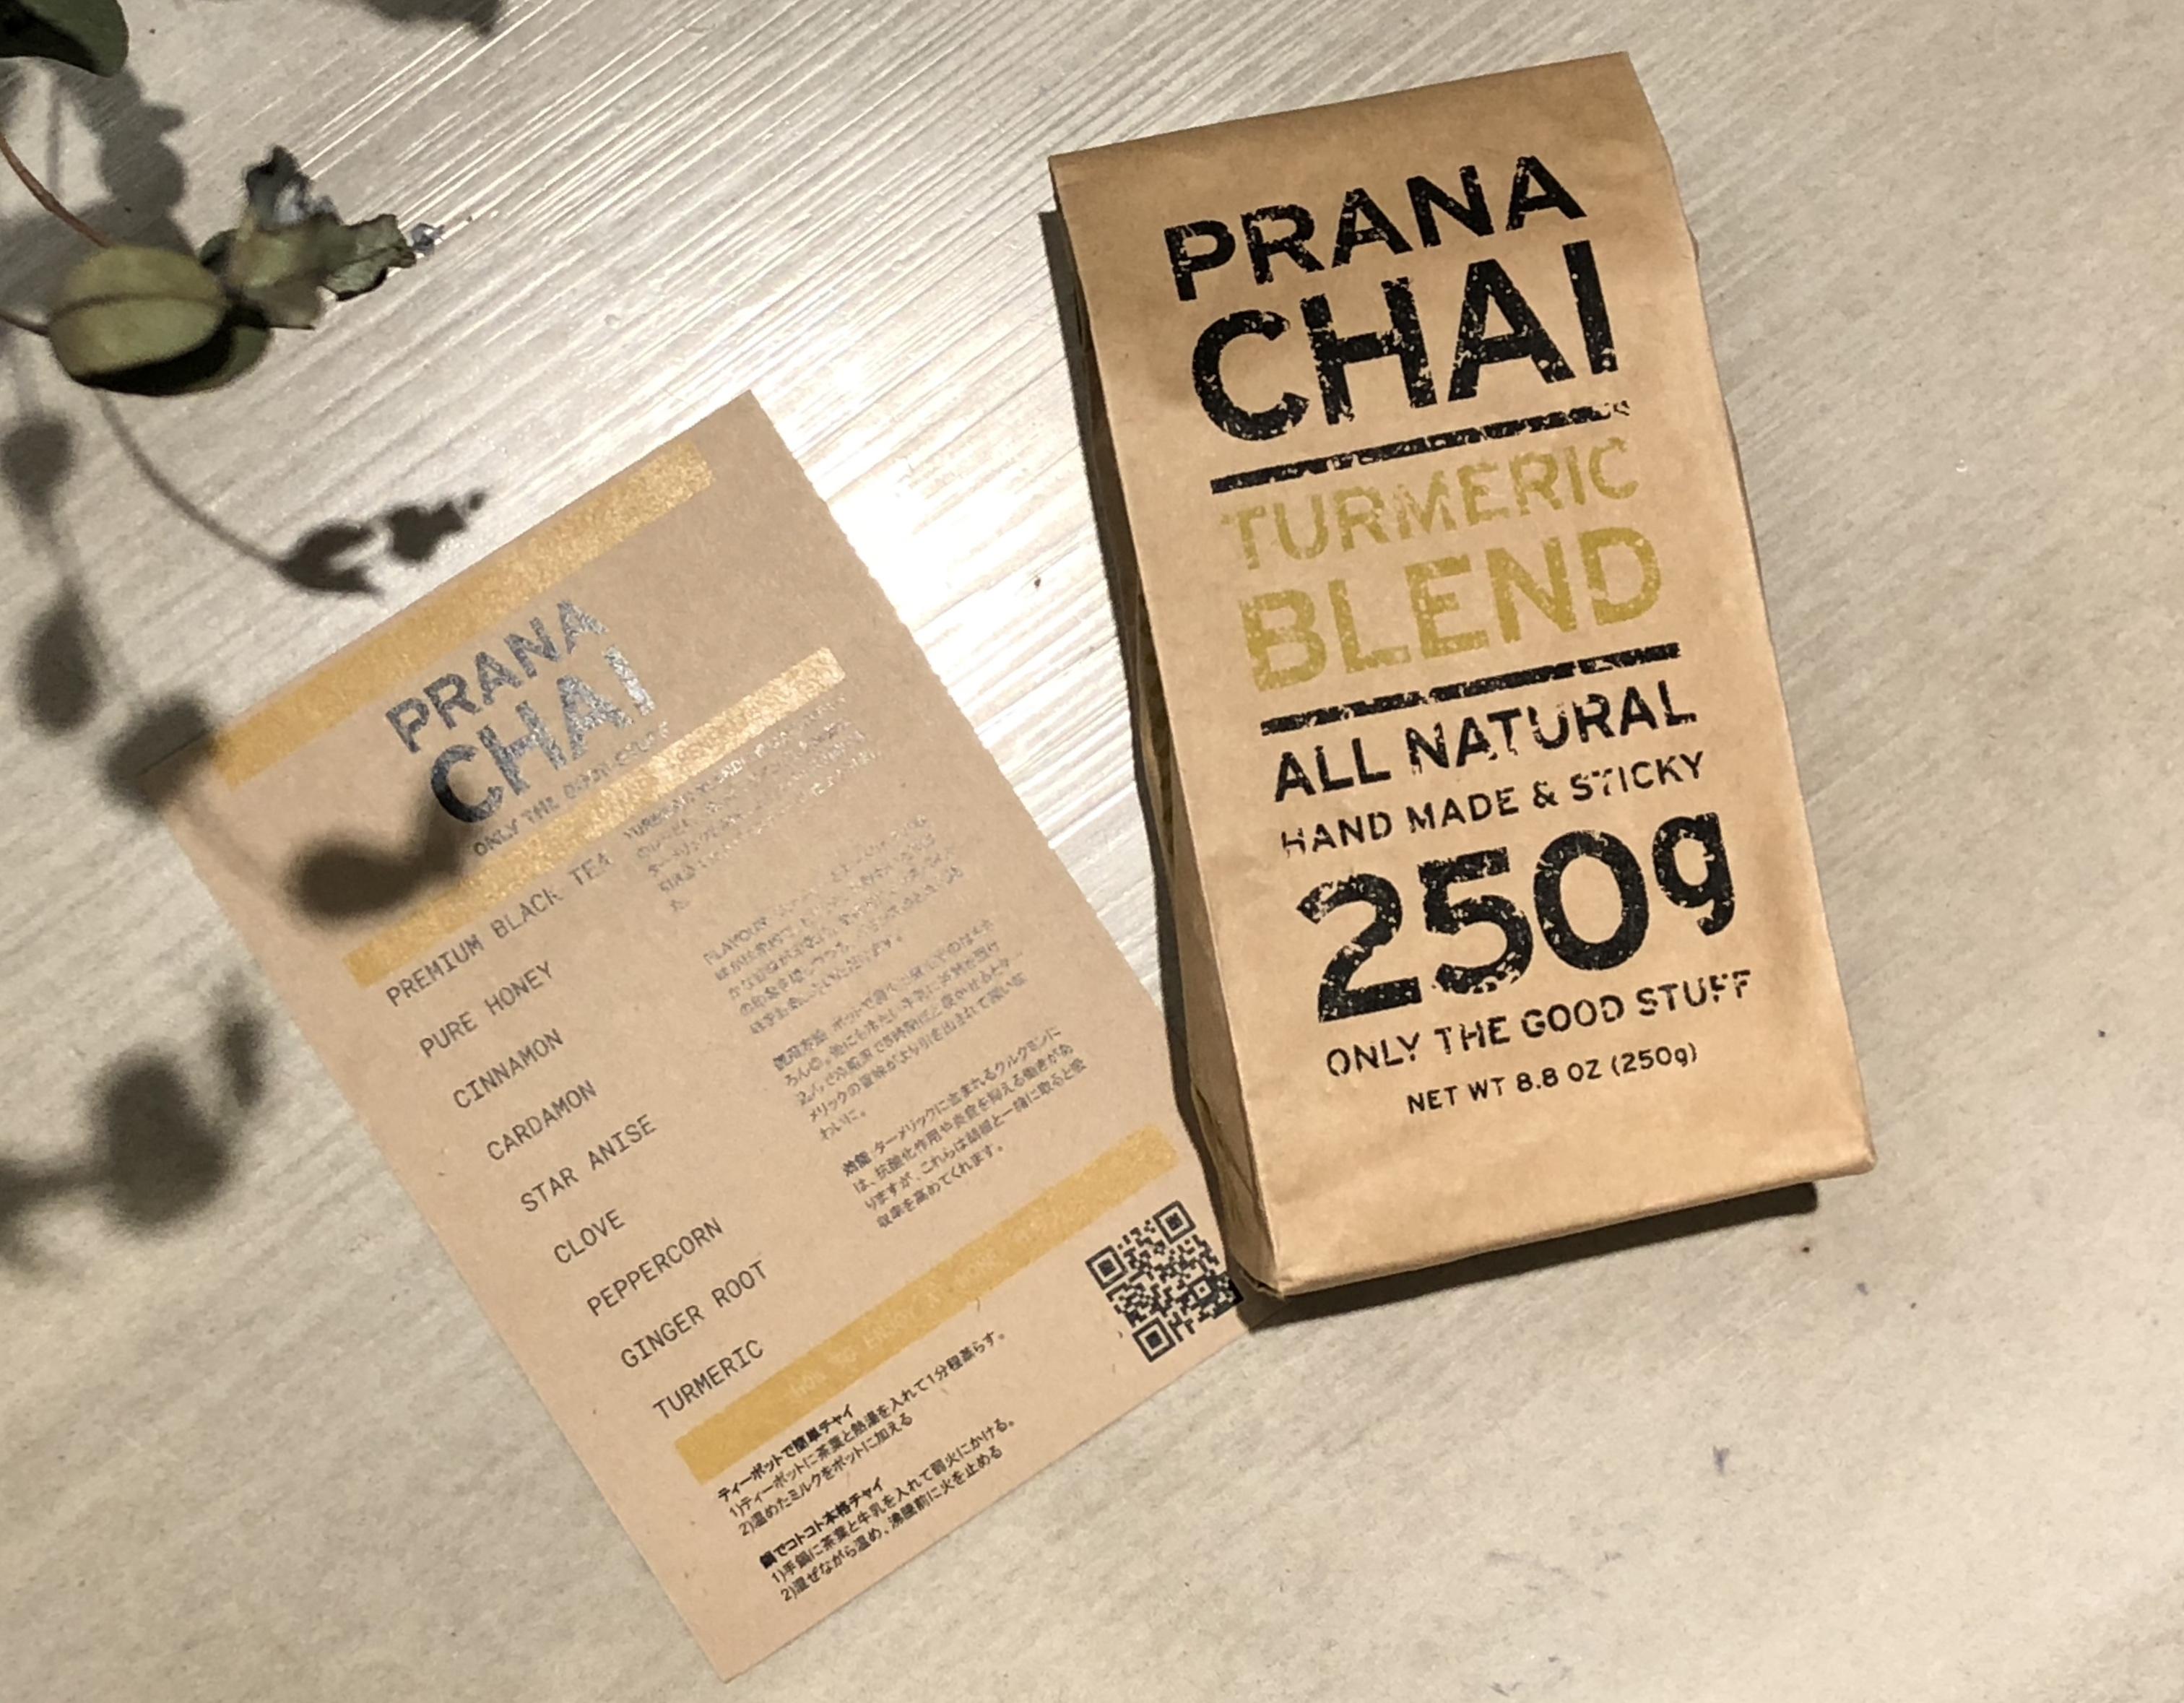 PRANA CHAI プラナチャイ TURMERIC BLEND 250g